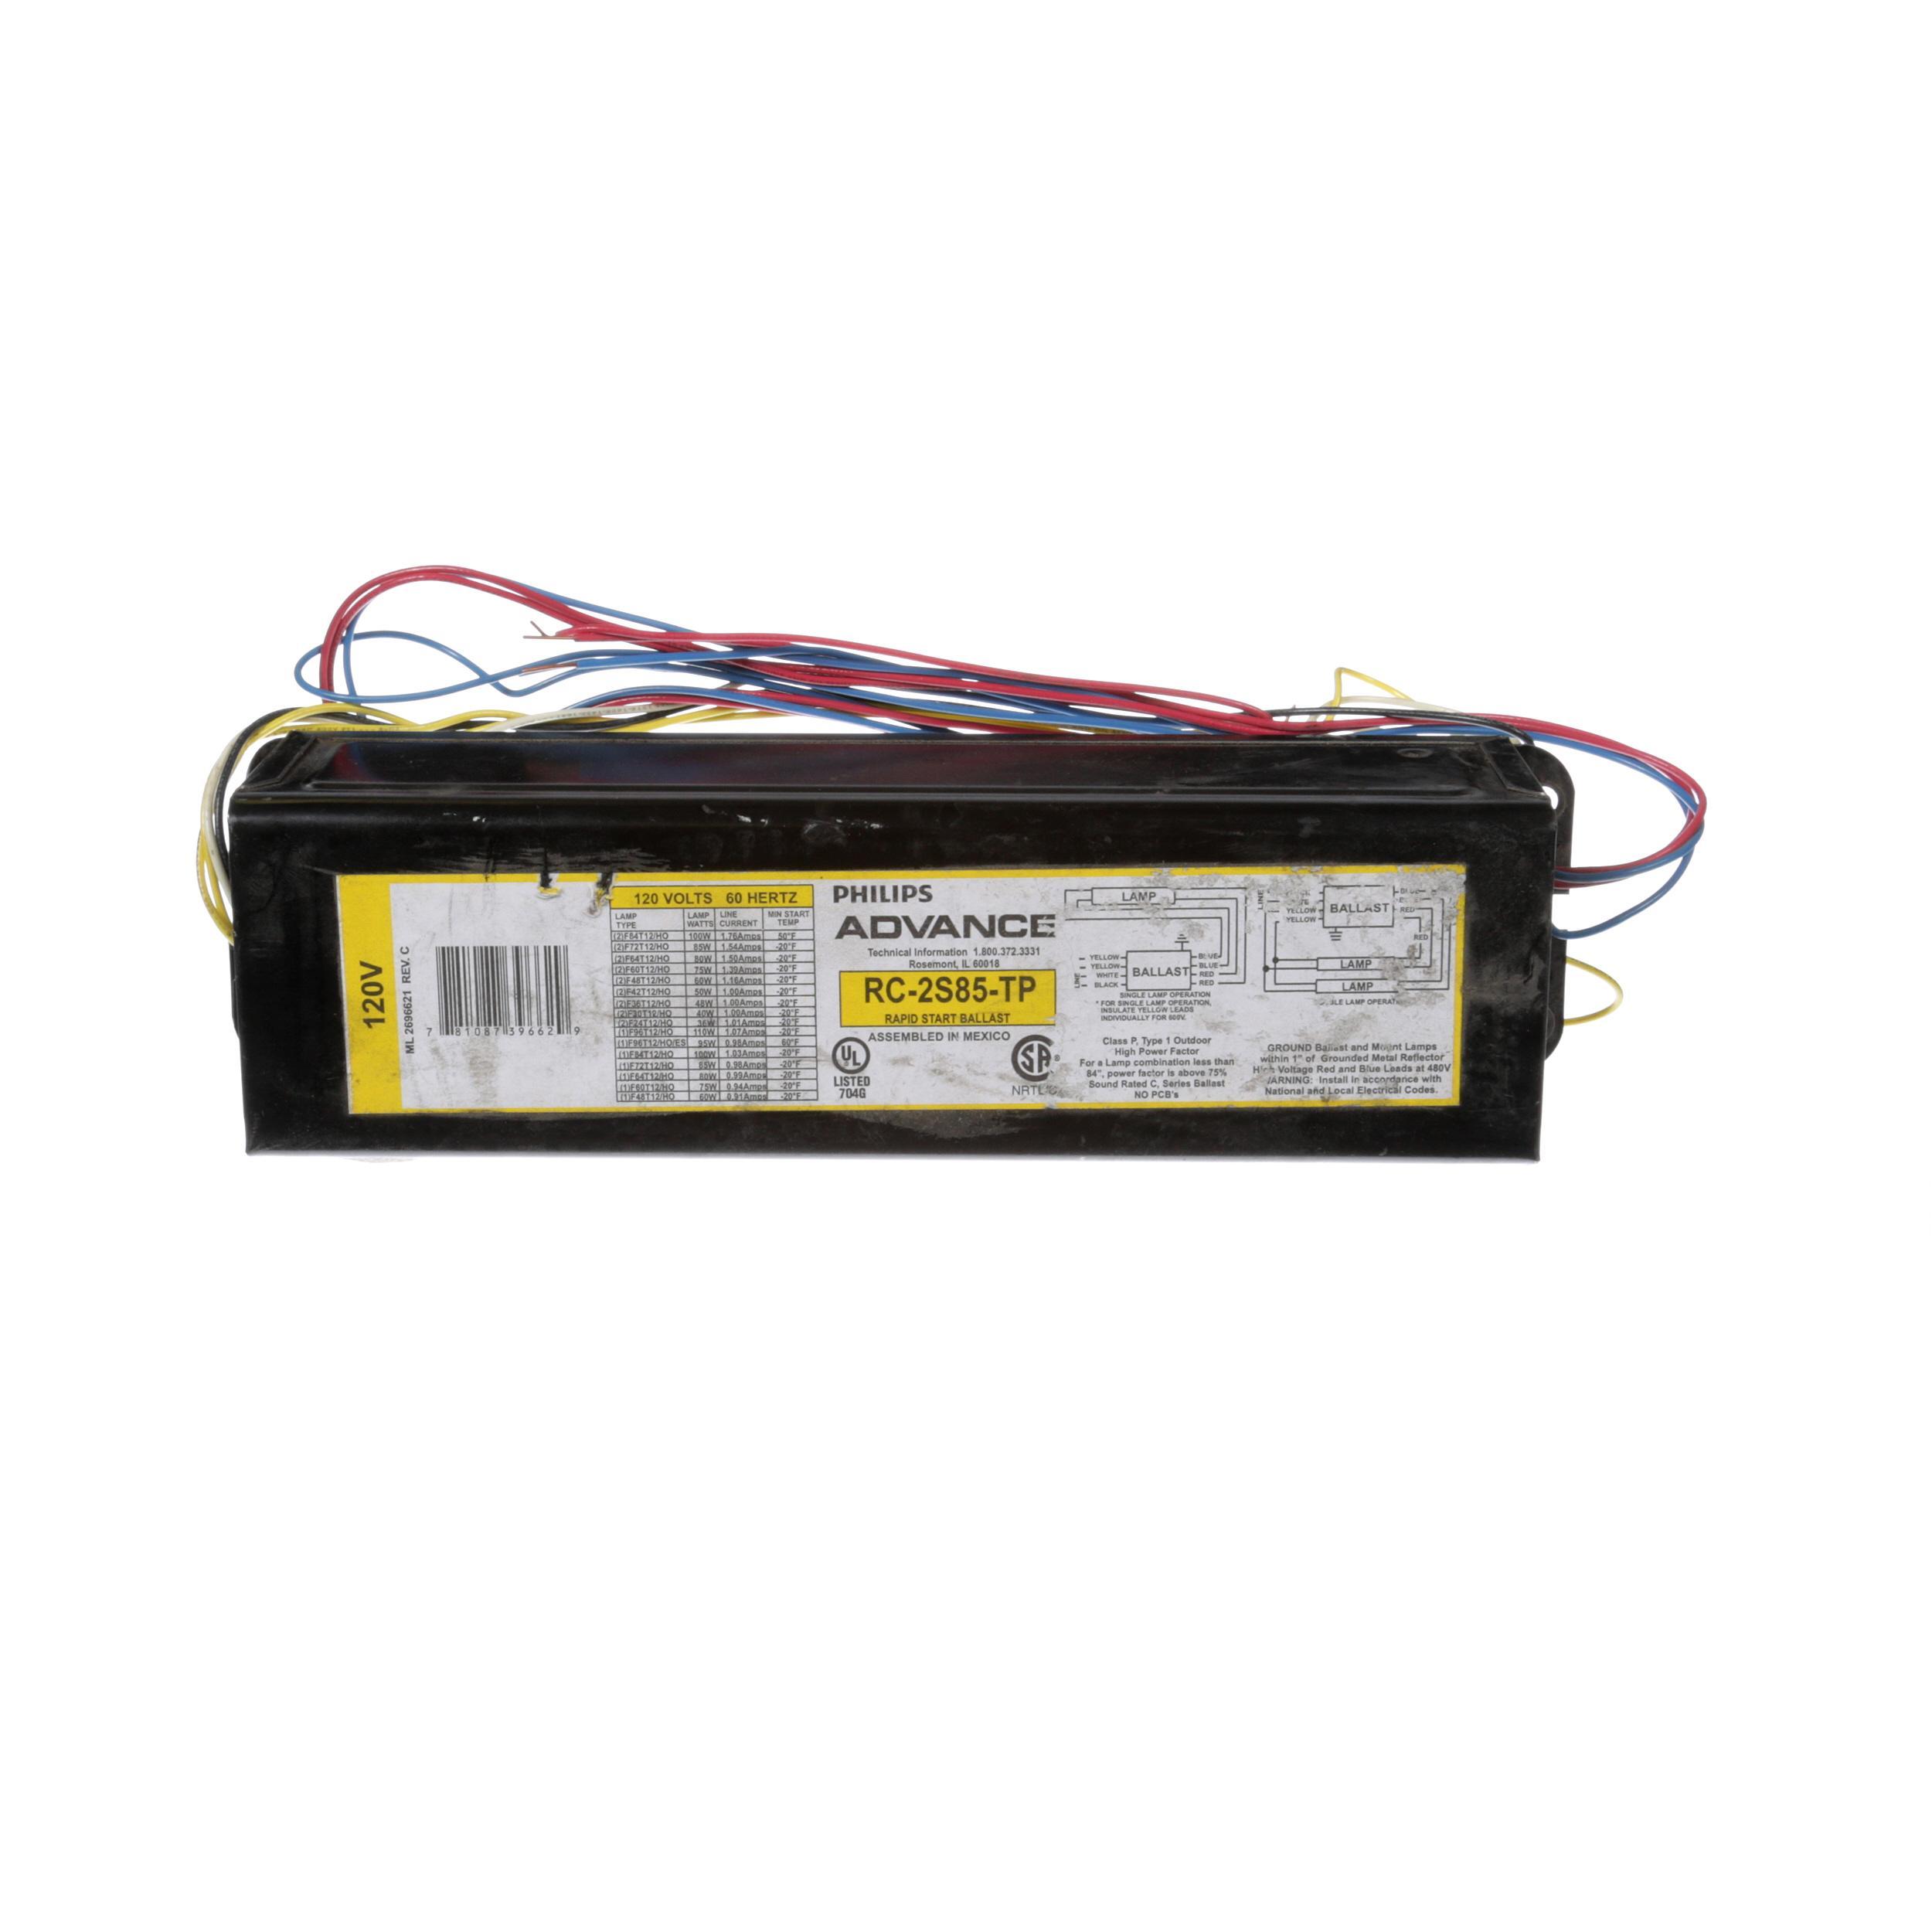 MASTER-BILT BALLAST, 2 LAMP, 800 MA  490-XLH-TC-P, MAGNETEK (UL, CSA)